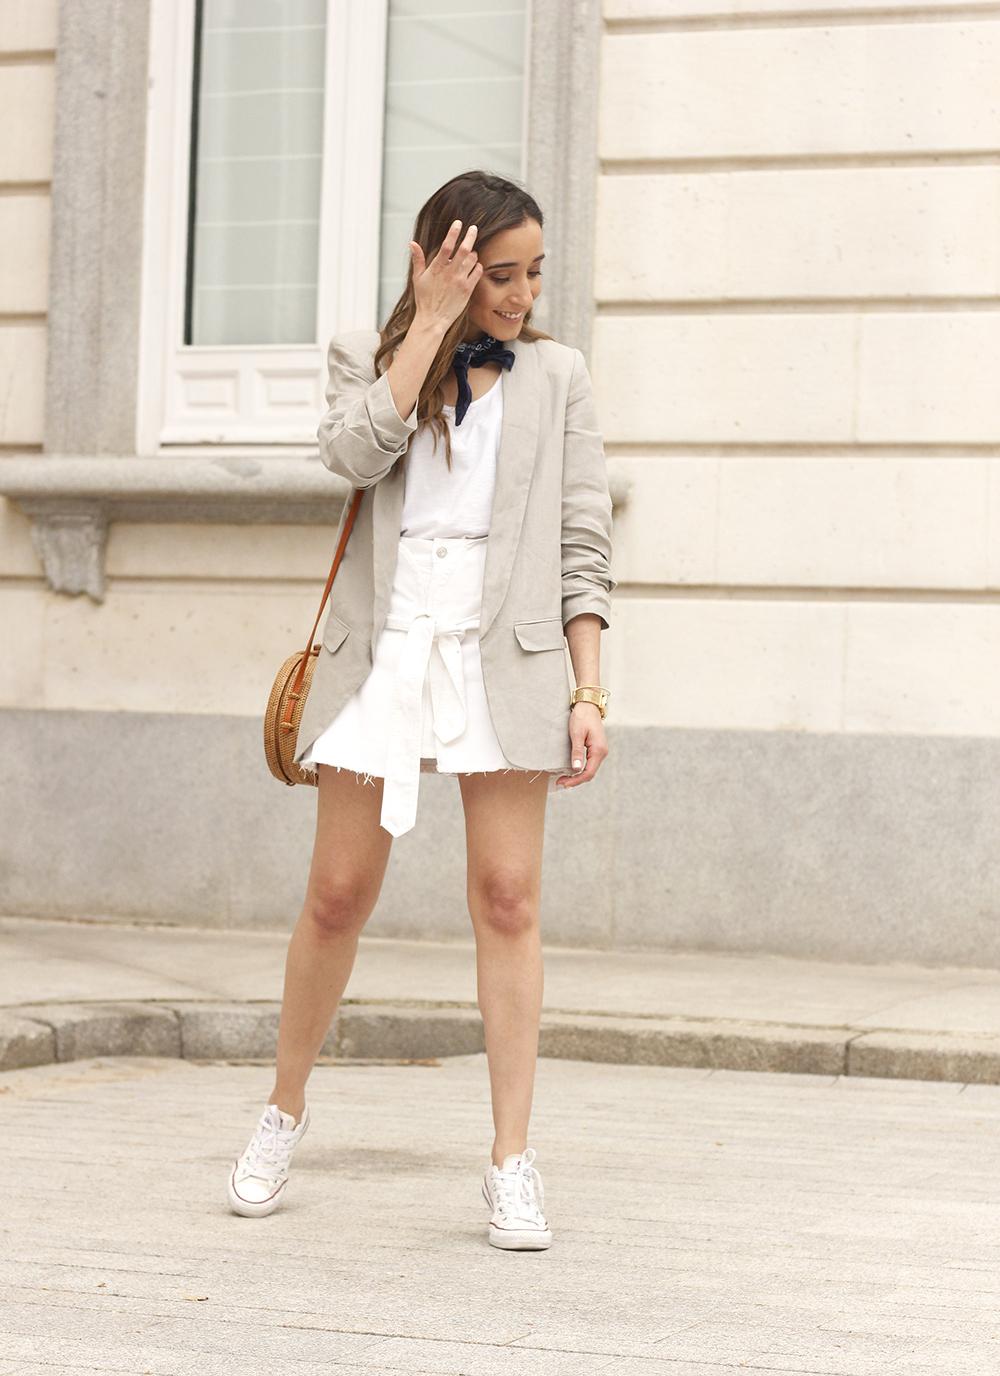 gray linen blazer blue bandana white converse bamboo bag street style oufit 201808